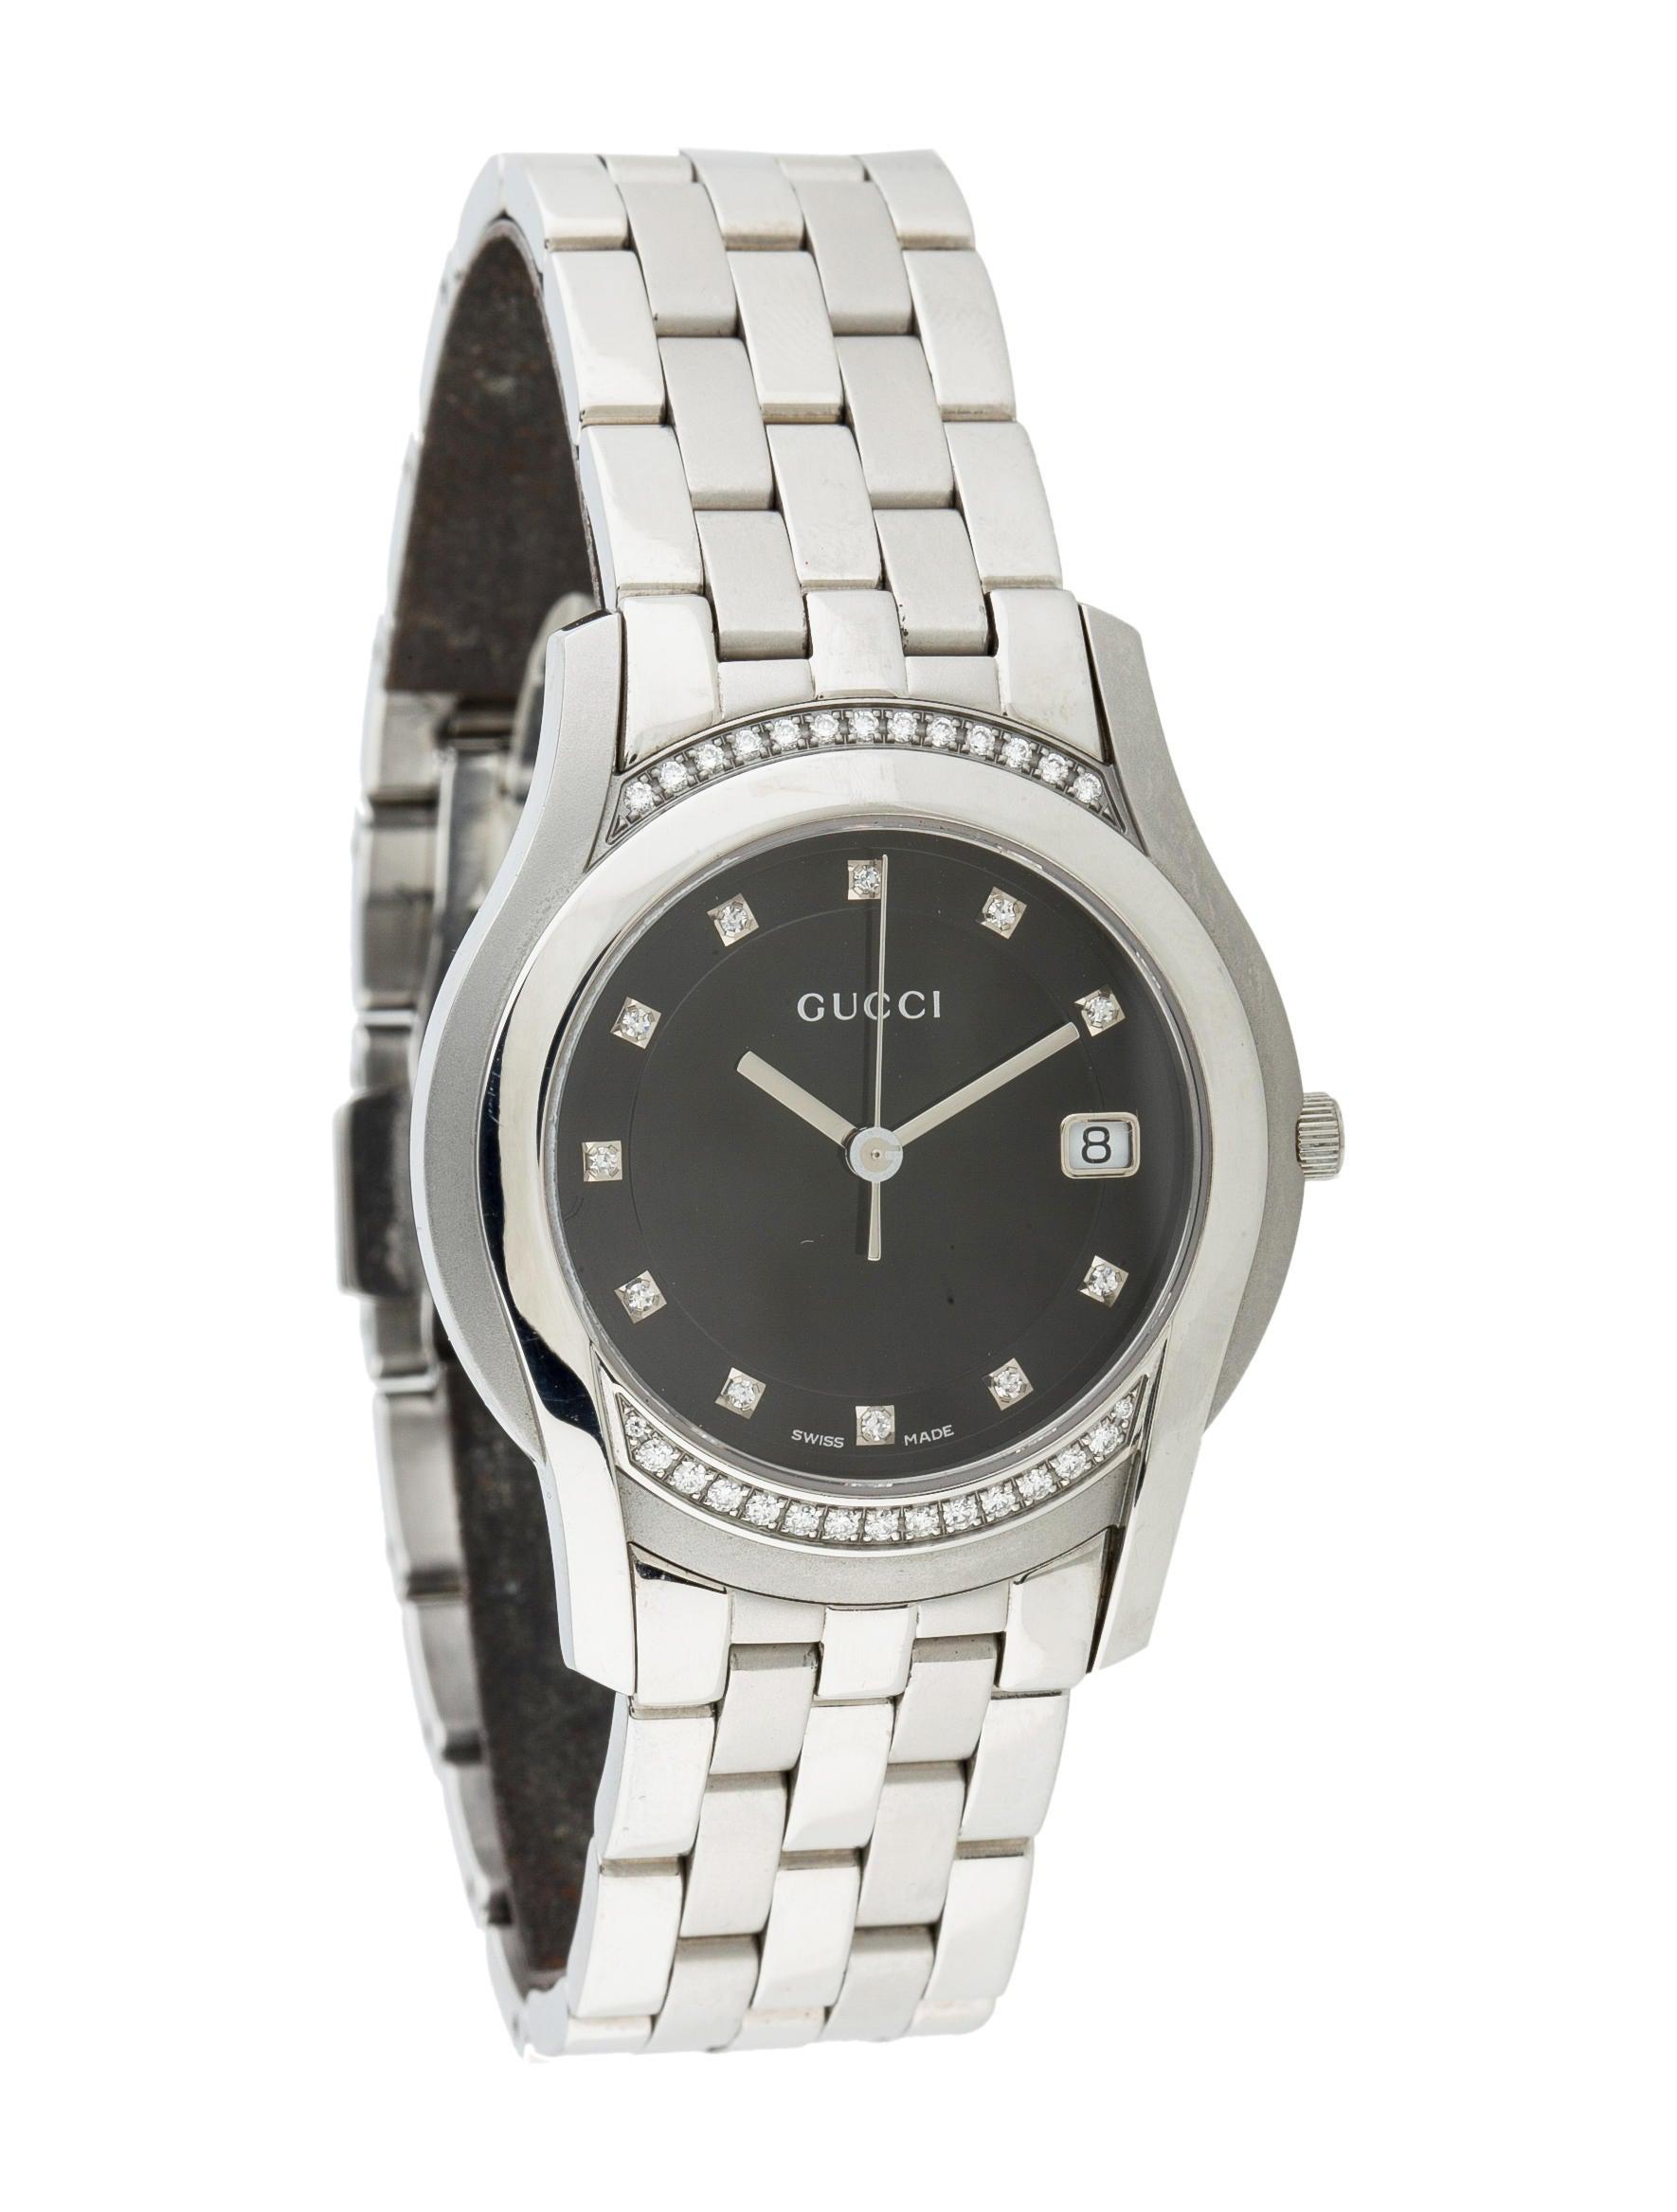 f0302e83f31 Gucci 5500M Diamond Watch - Bracelet - GUC49106